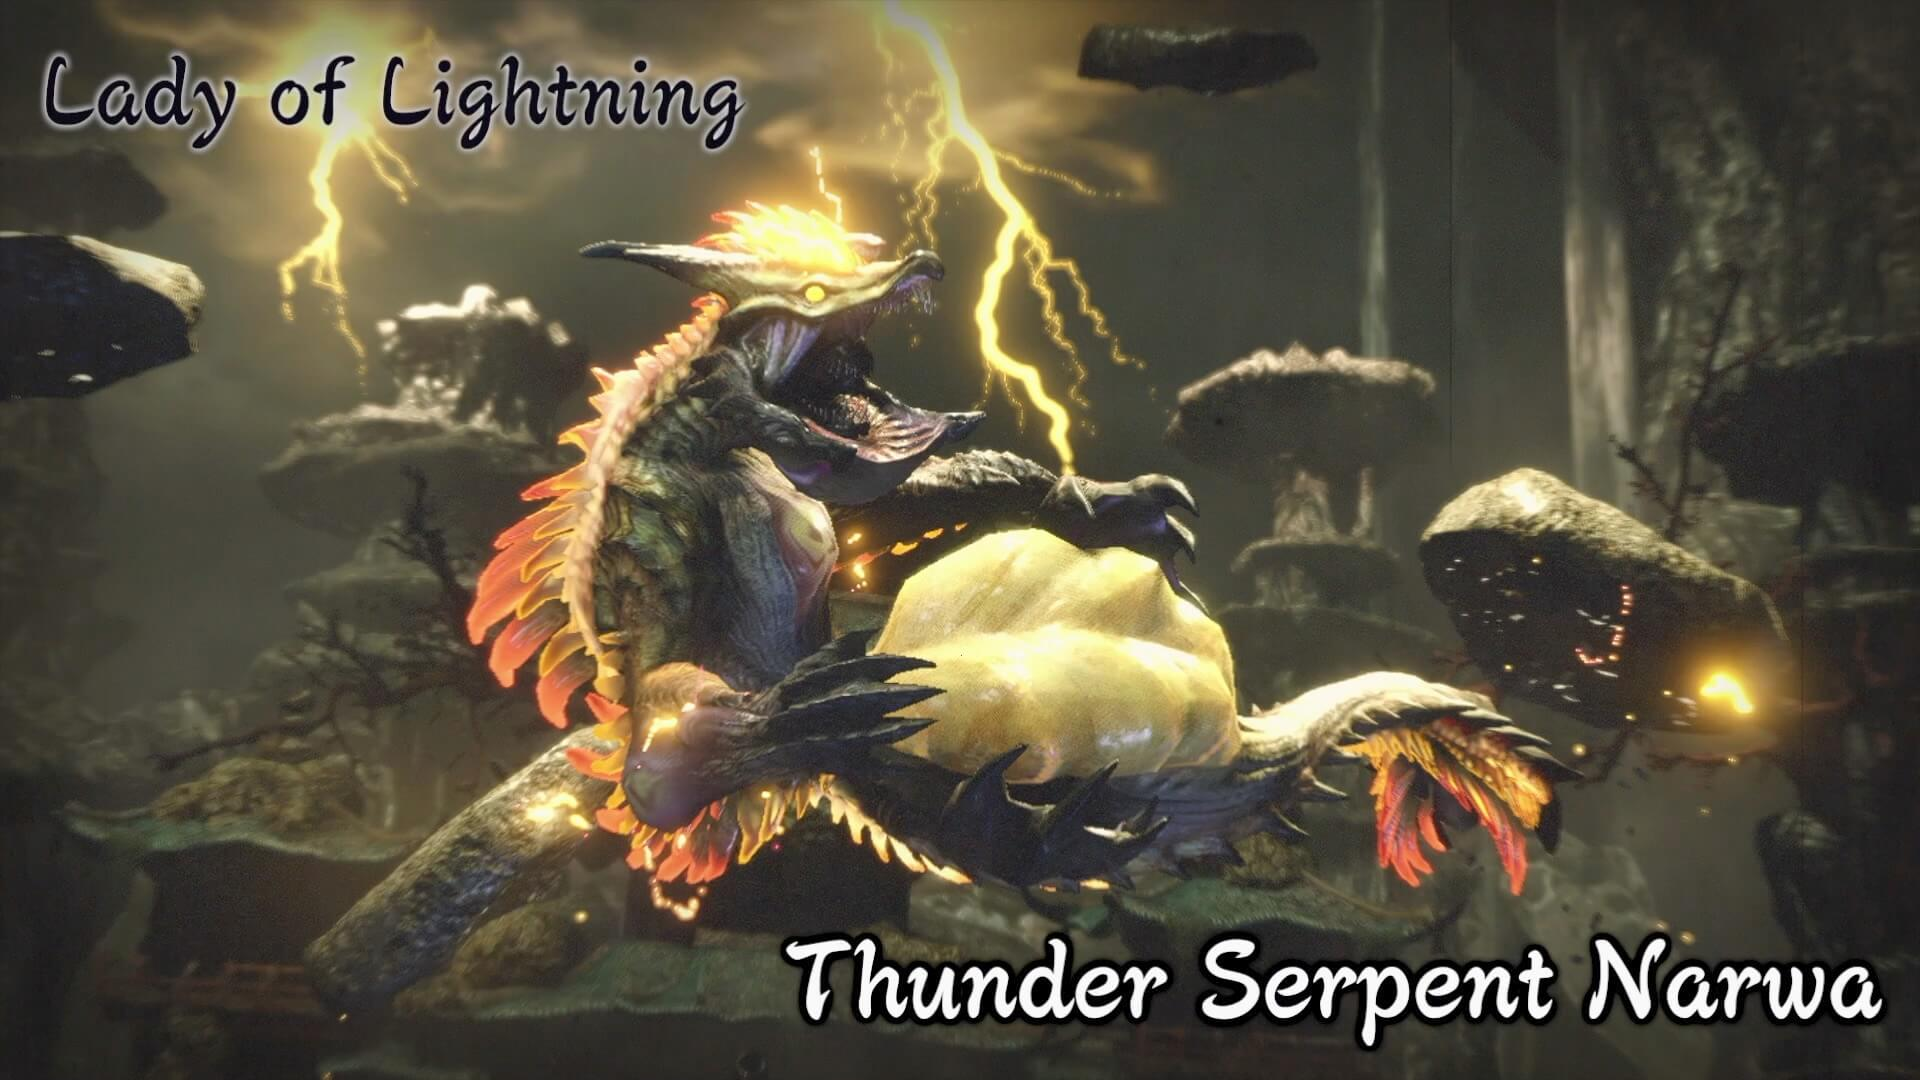 Lady of Lightning